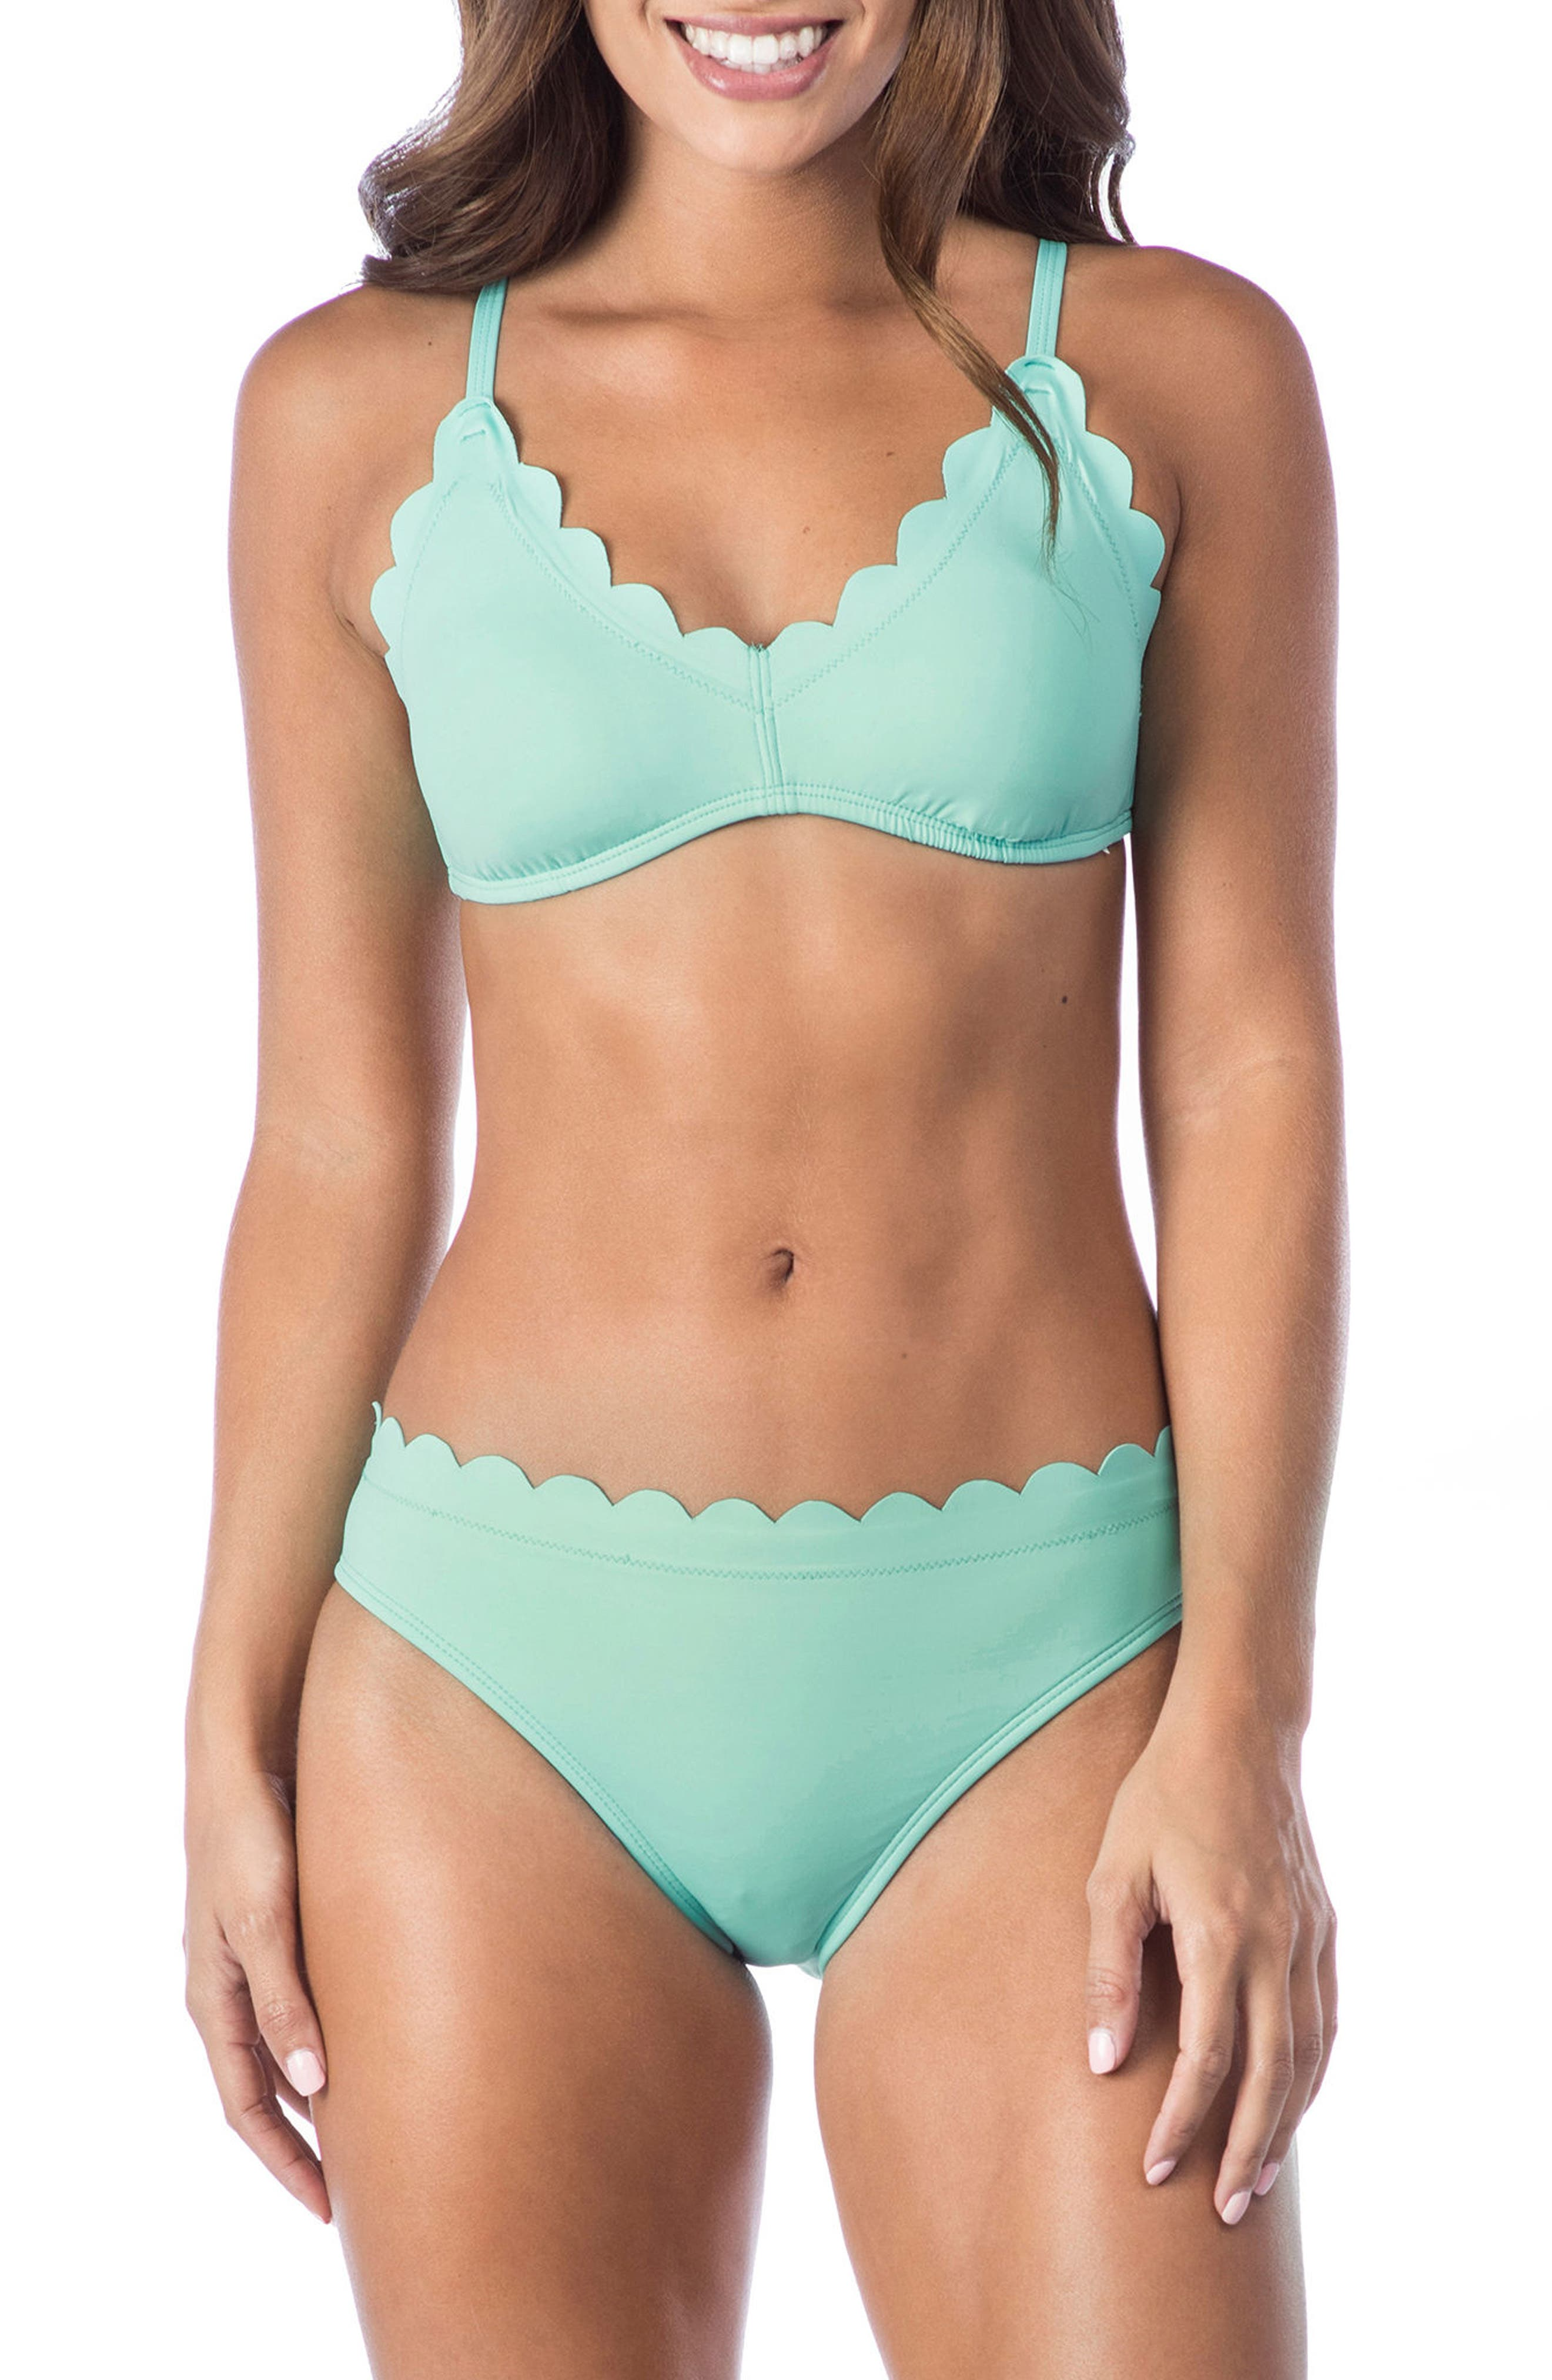 Petal Pusher Bikini Top,                             Alternate thumbnail 3, color,                             SEAFOAM